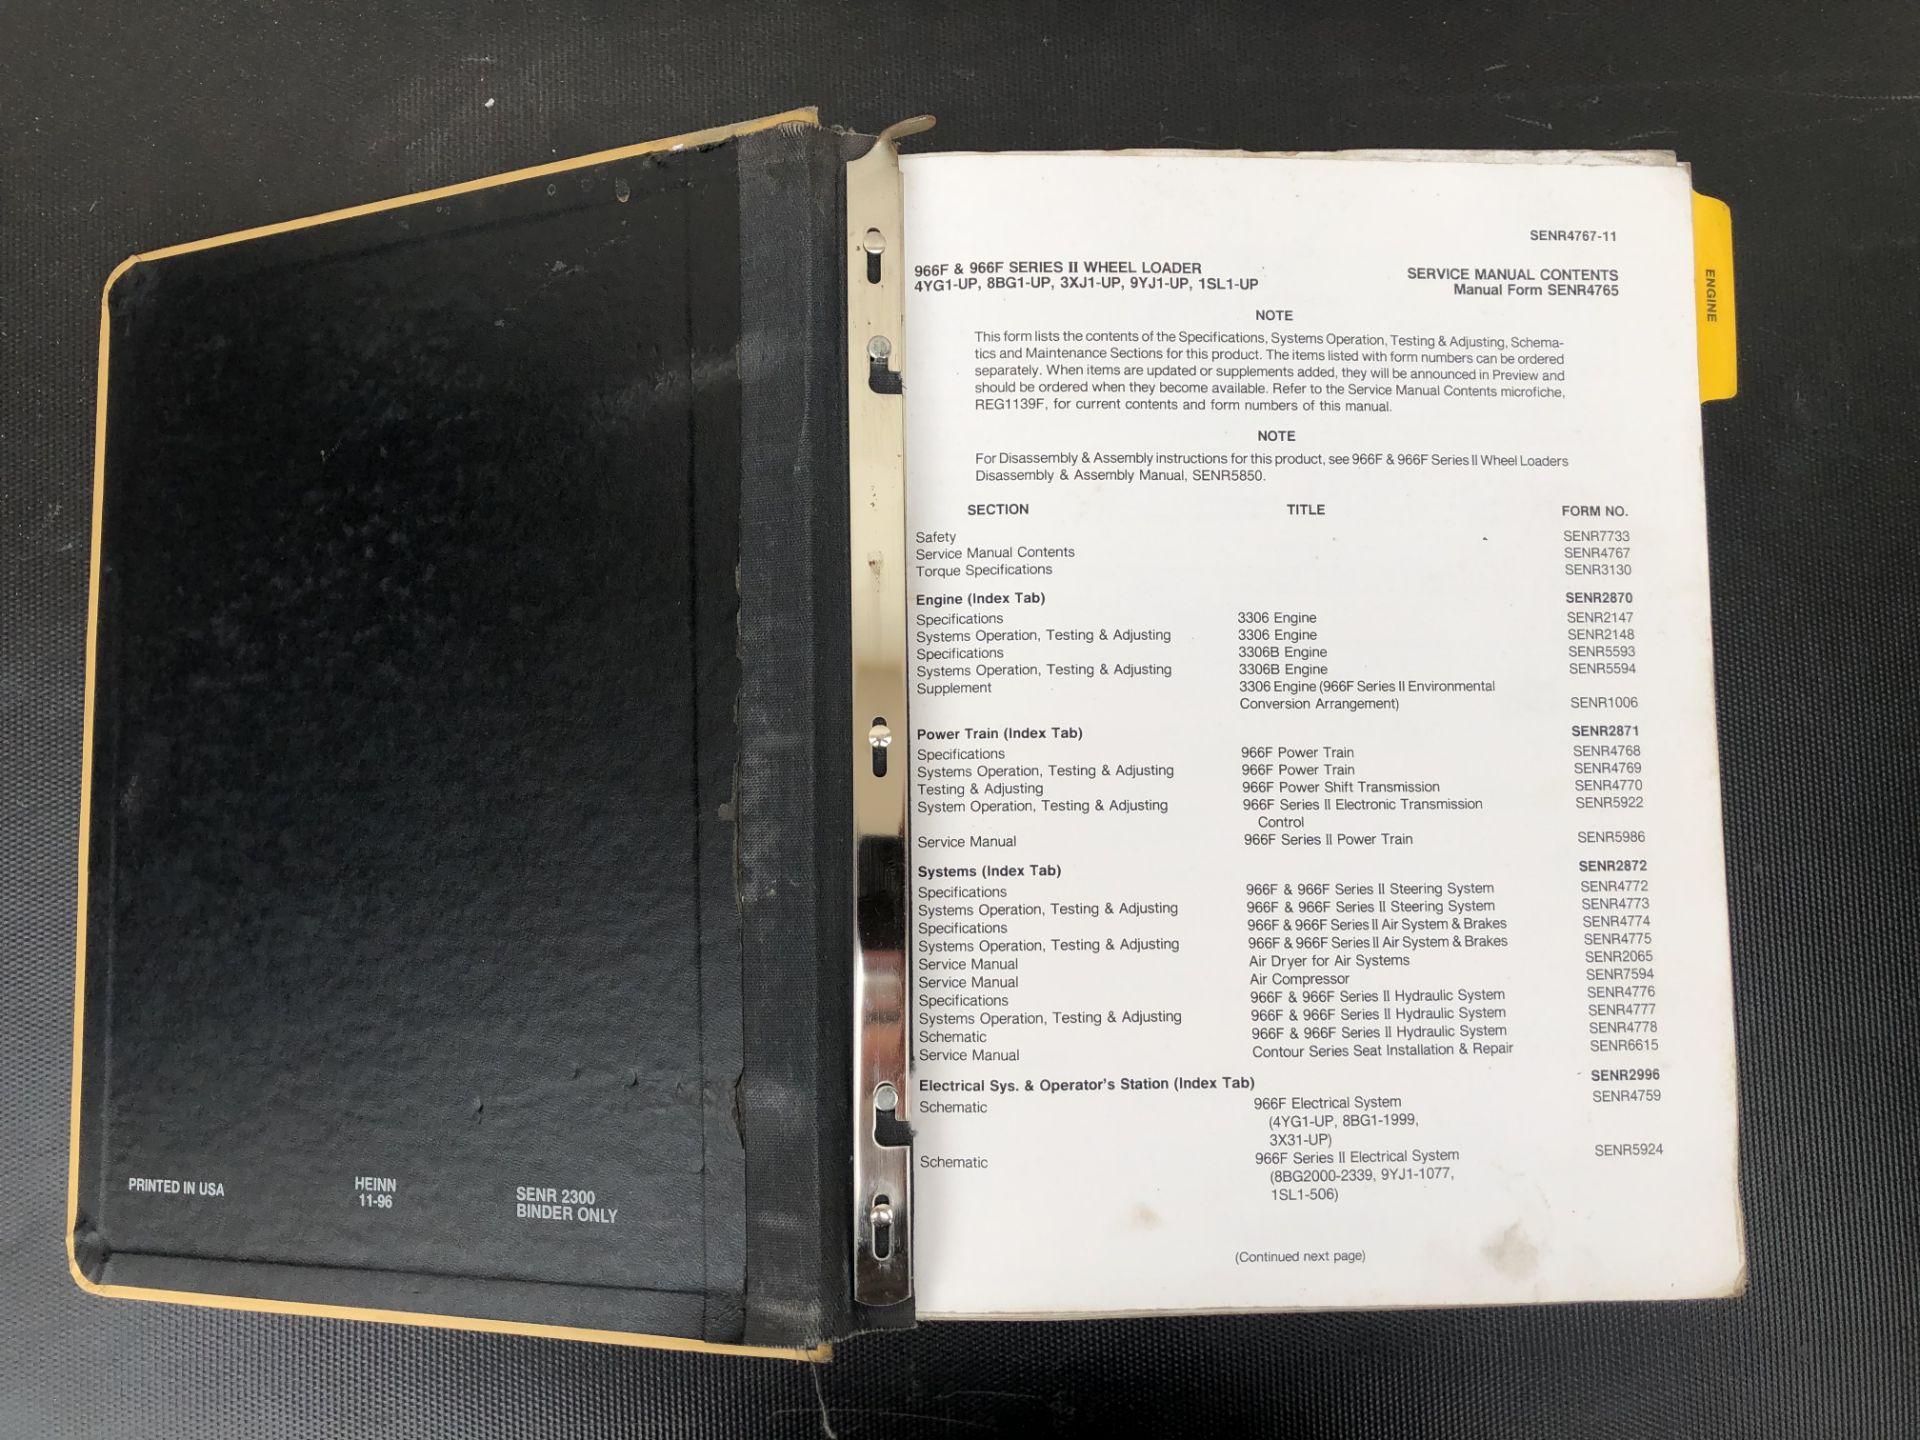 CATERPILLAR 966F 966F II SERVICE MANUAL, GENUINE FACTORY CAT WORKSHOP MANUAL - Image 3 of 3